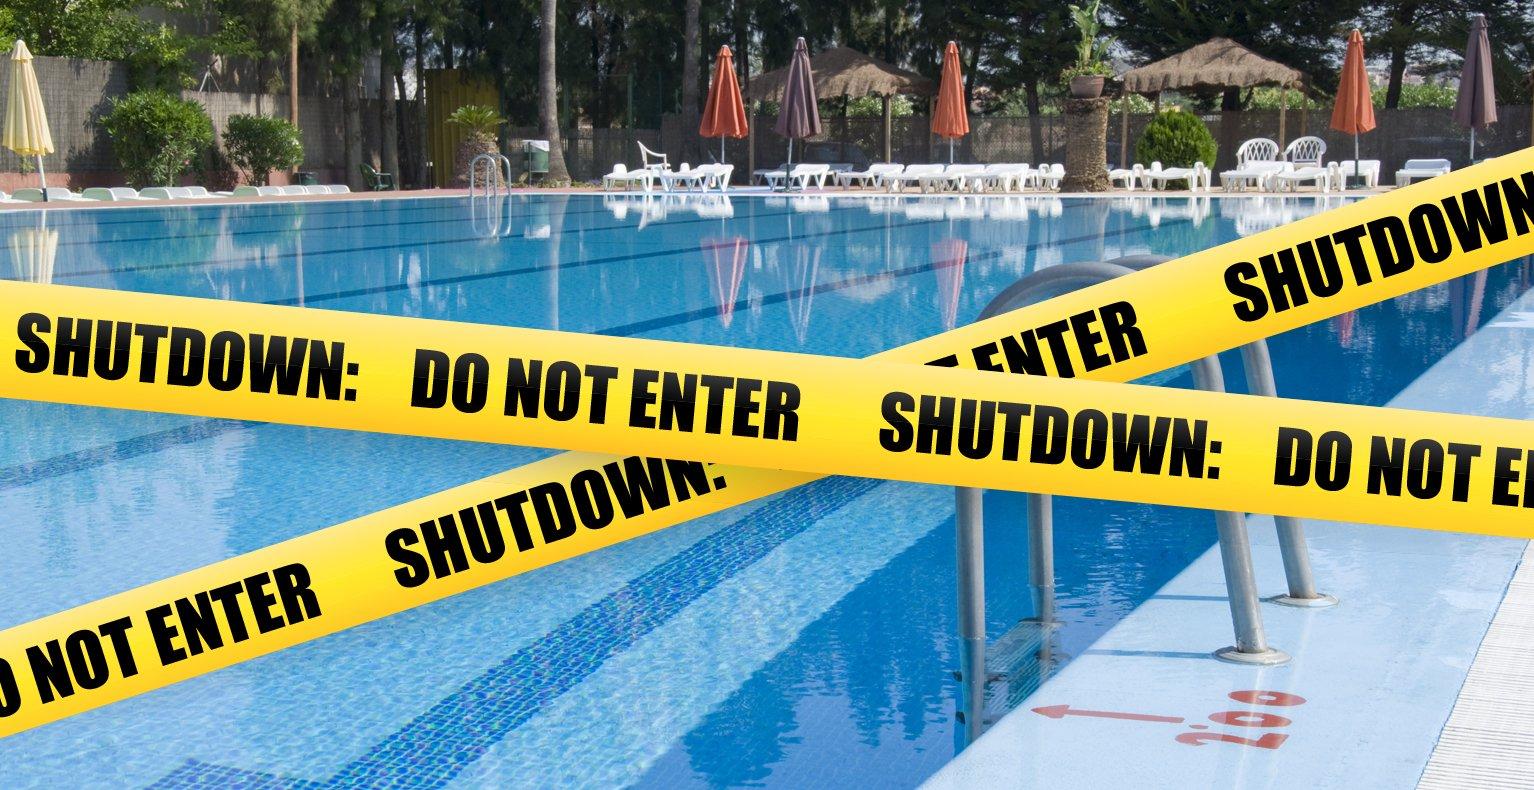 PoolShutdown